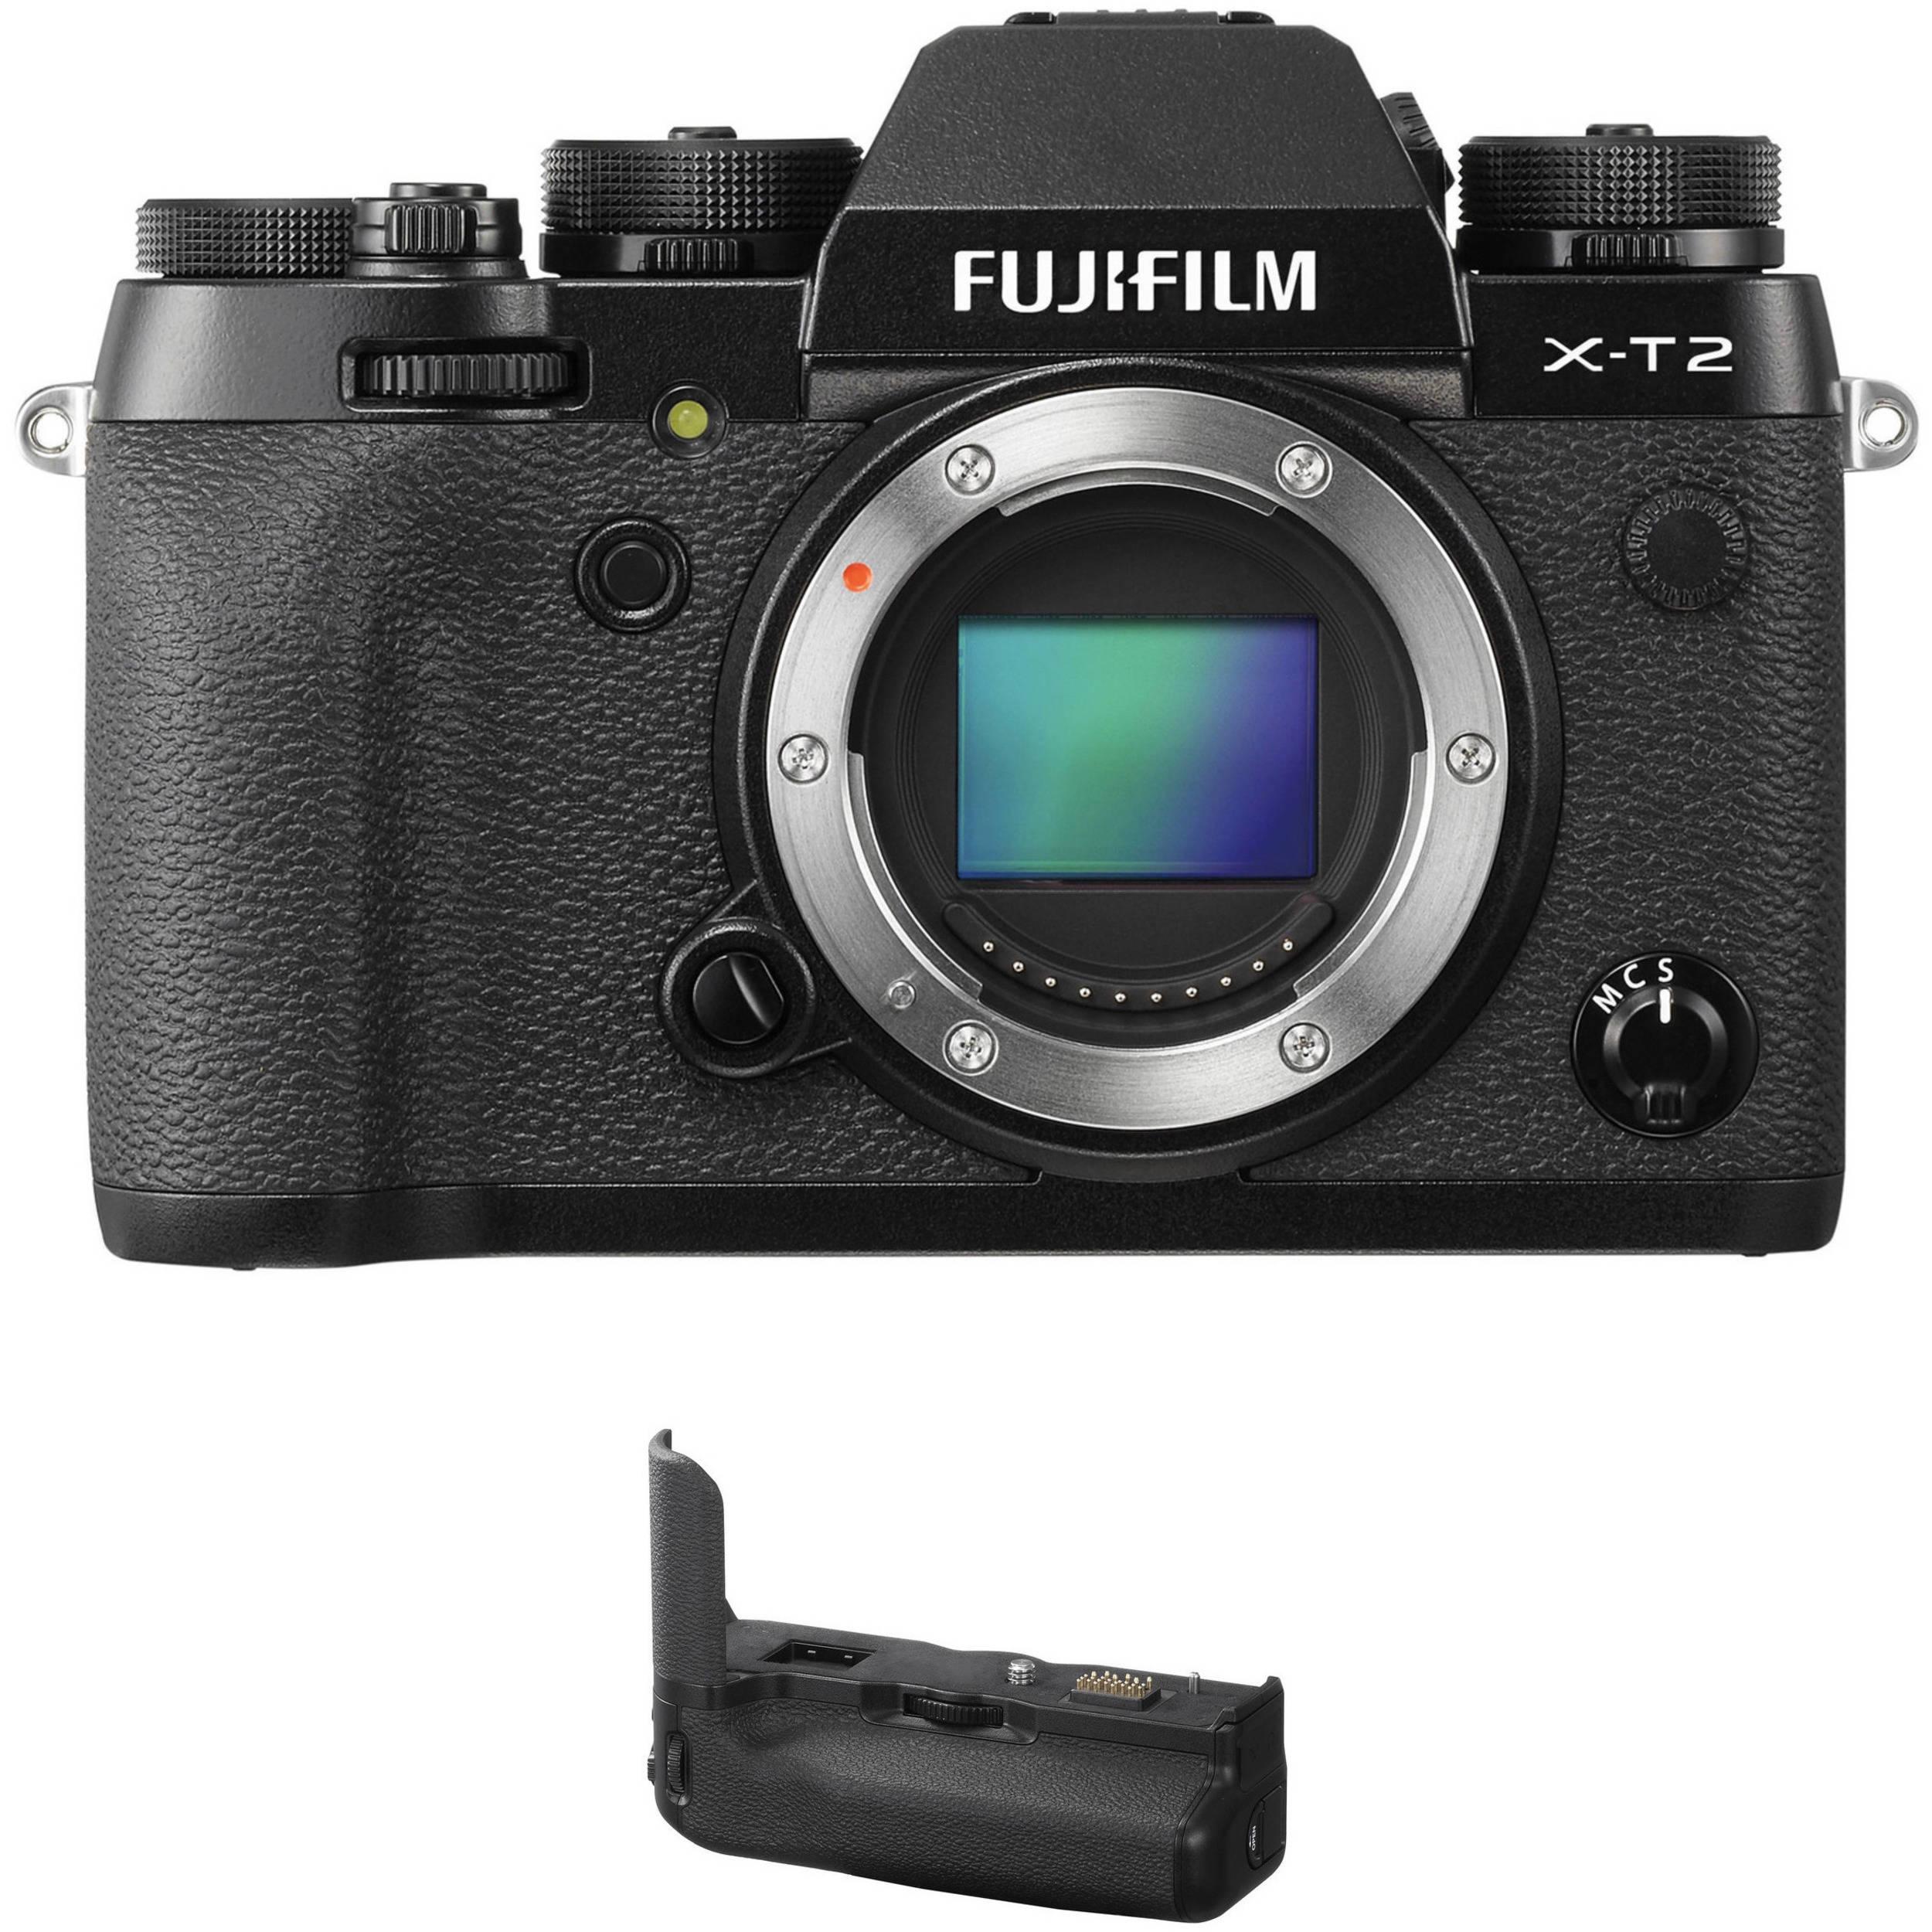 Camera Fujifilm Digital Cameras fujifilm mirrorless digital cameras bh photo video x t2 camera body with battery grip kit black